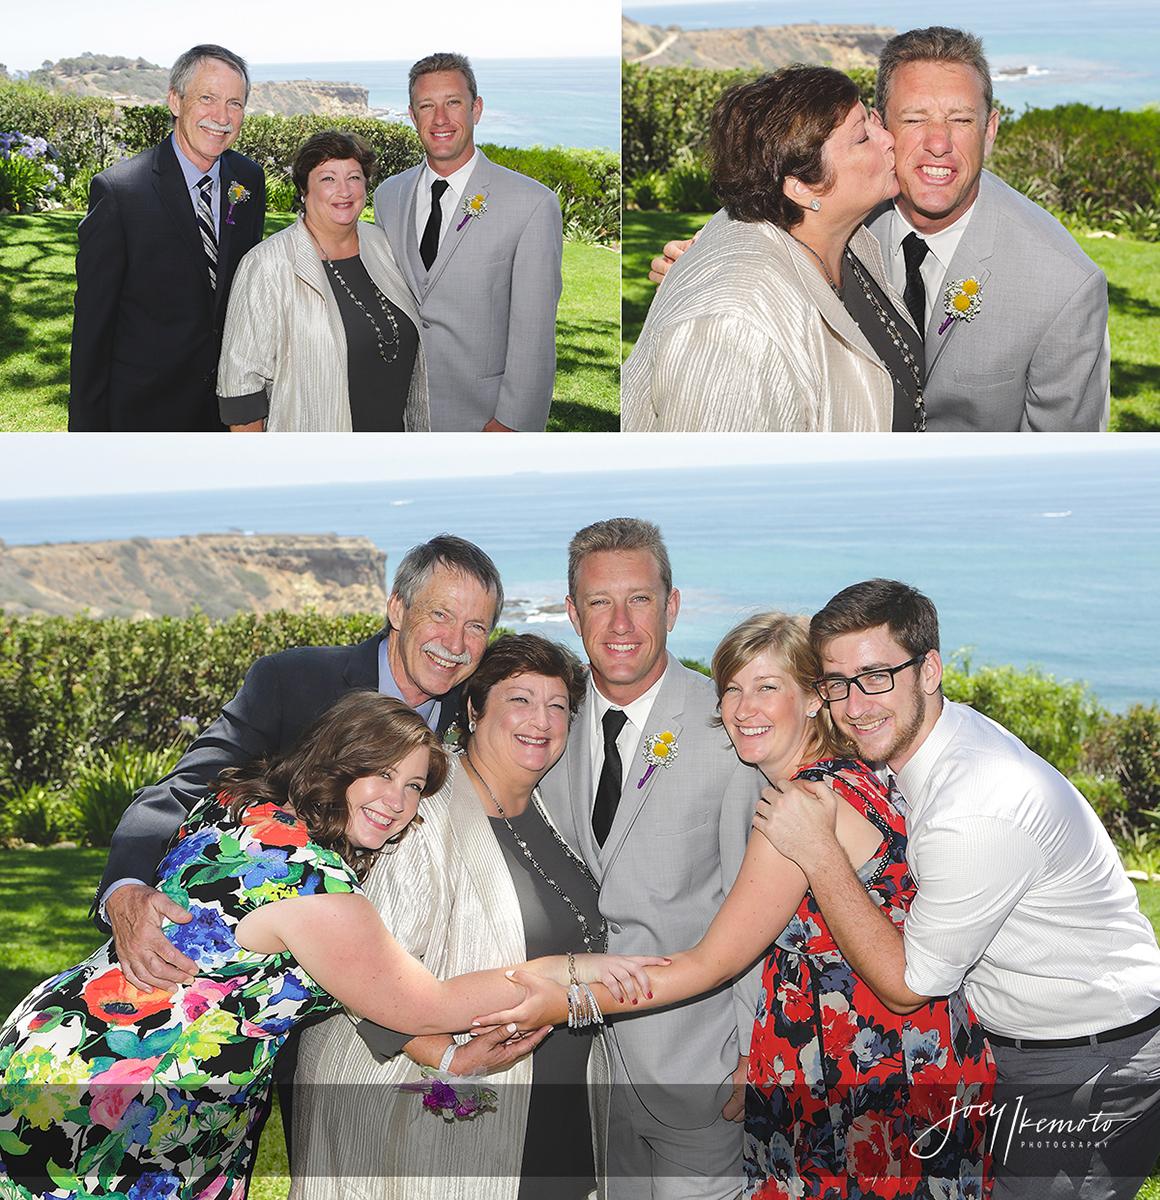 Wayfarers-Chapel-and-Palos-Verdes-Wedding_0006_Blog-Collage-1471382681626